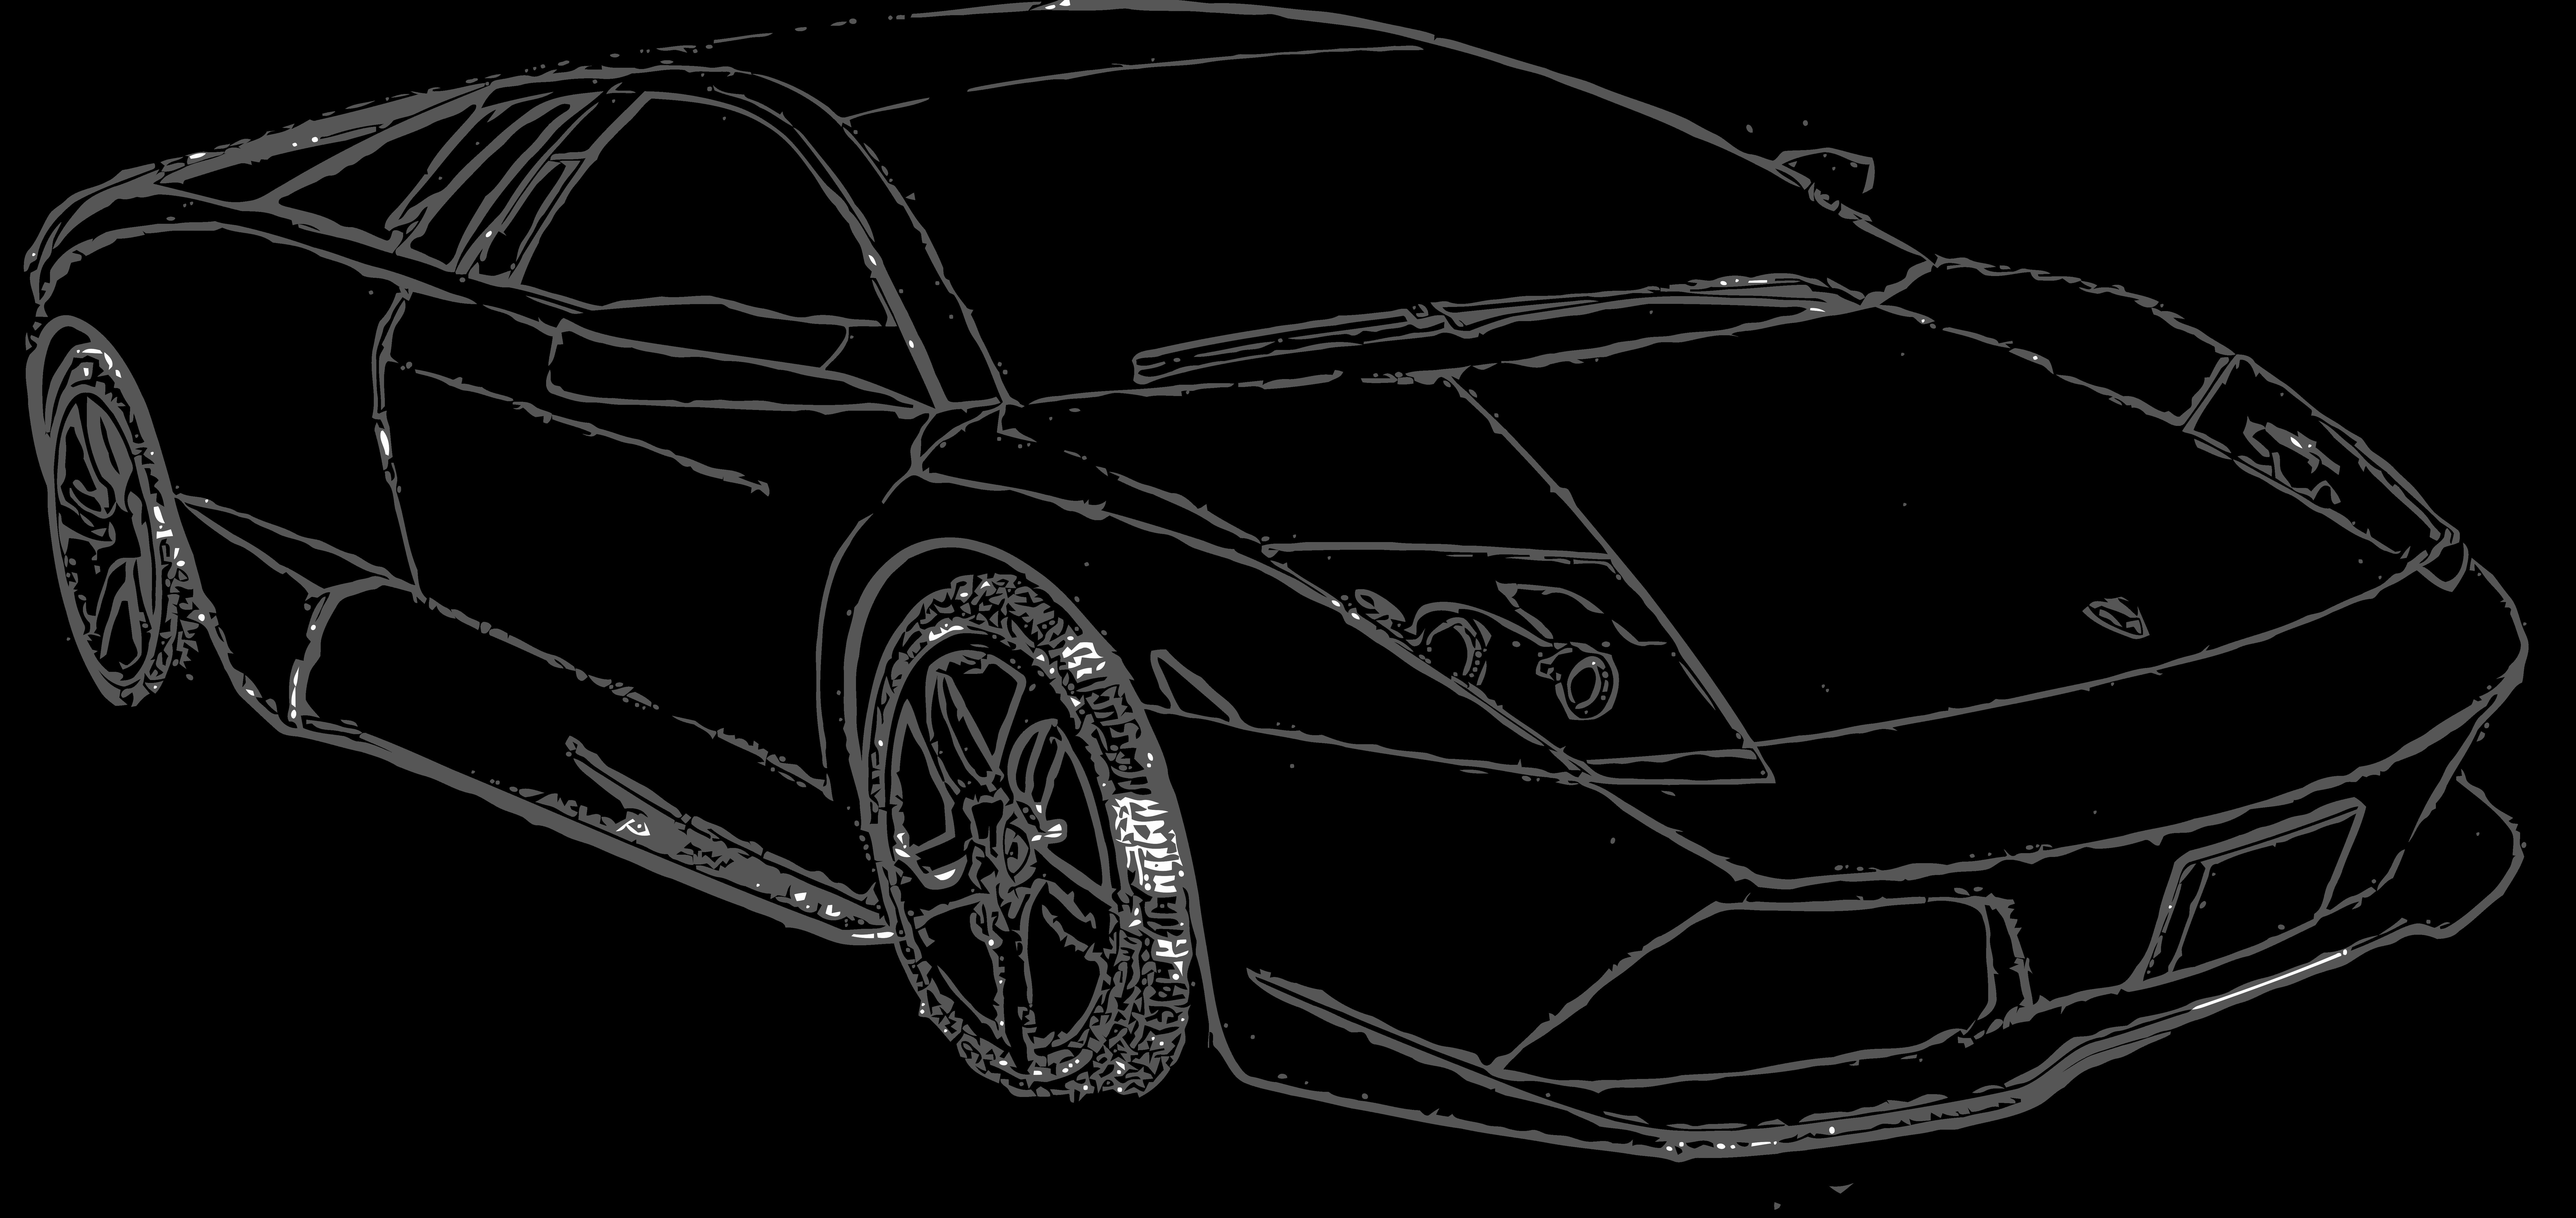 Pinewood Derby Lamborghini Template Elegant Free to Use Lamborghini Murcielago Lineart by E A 2 On